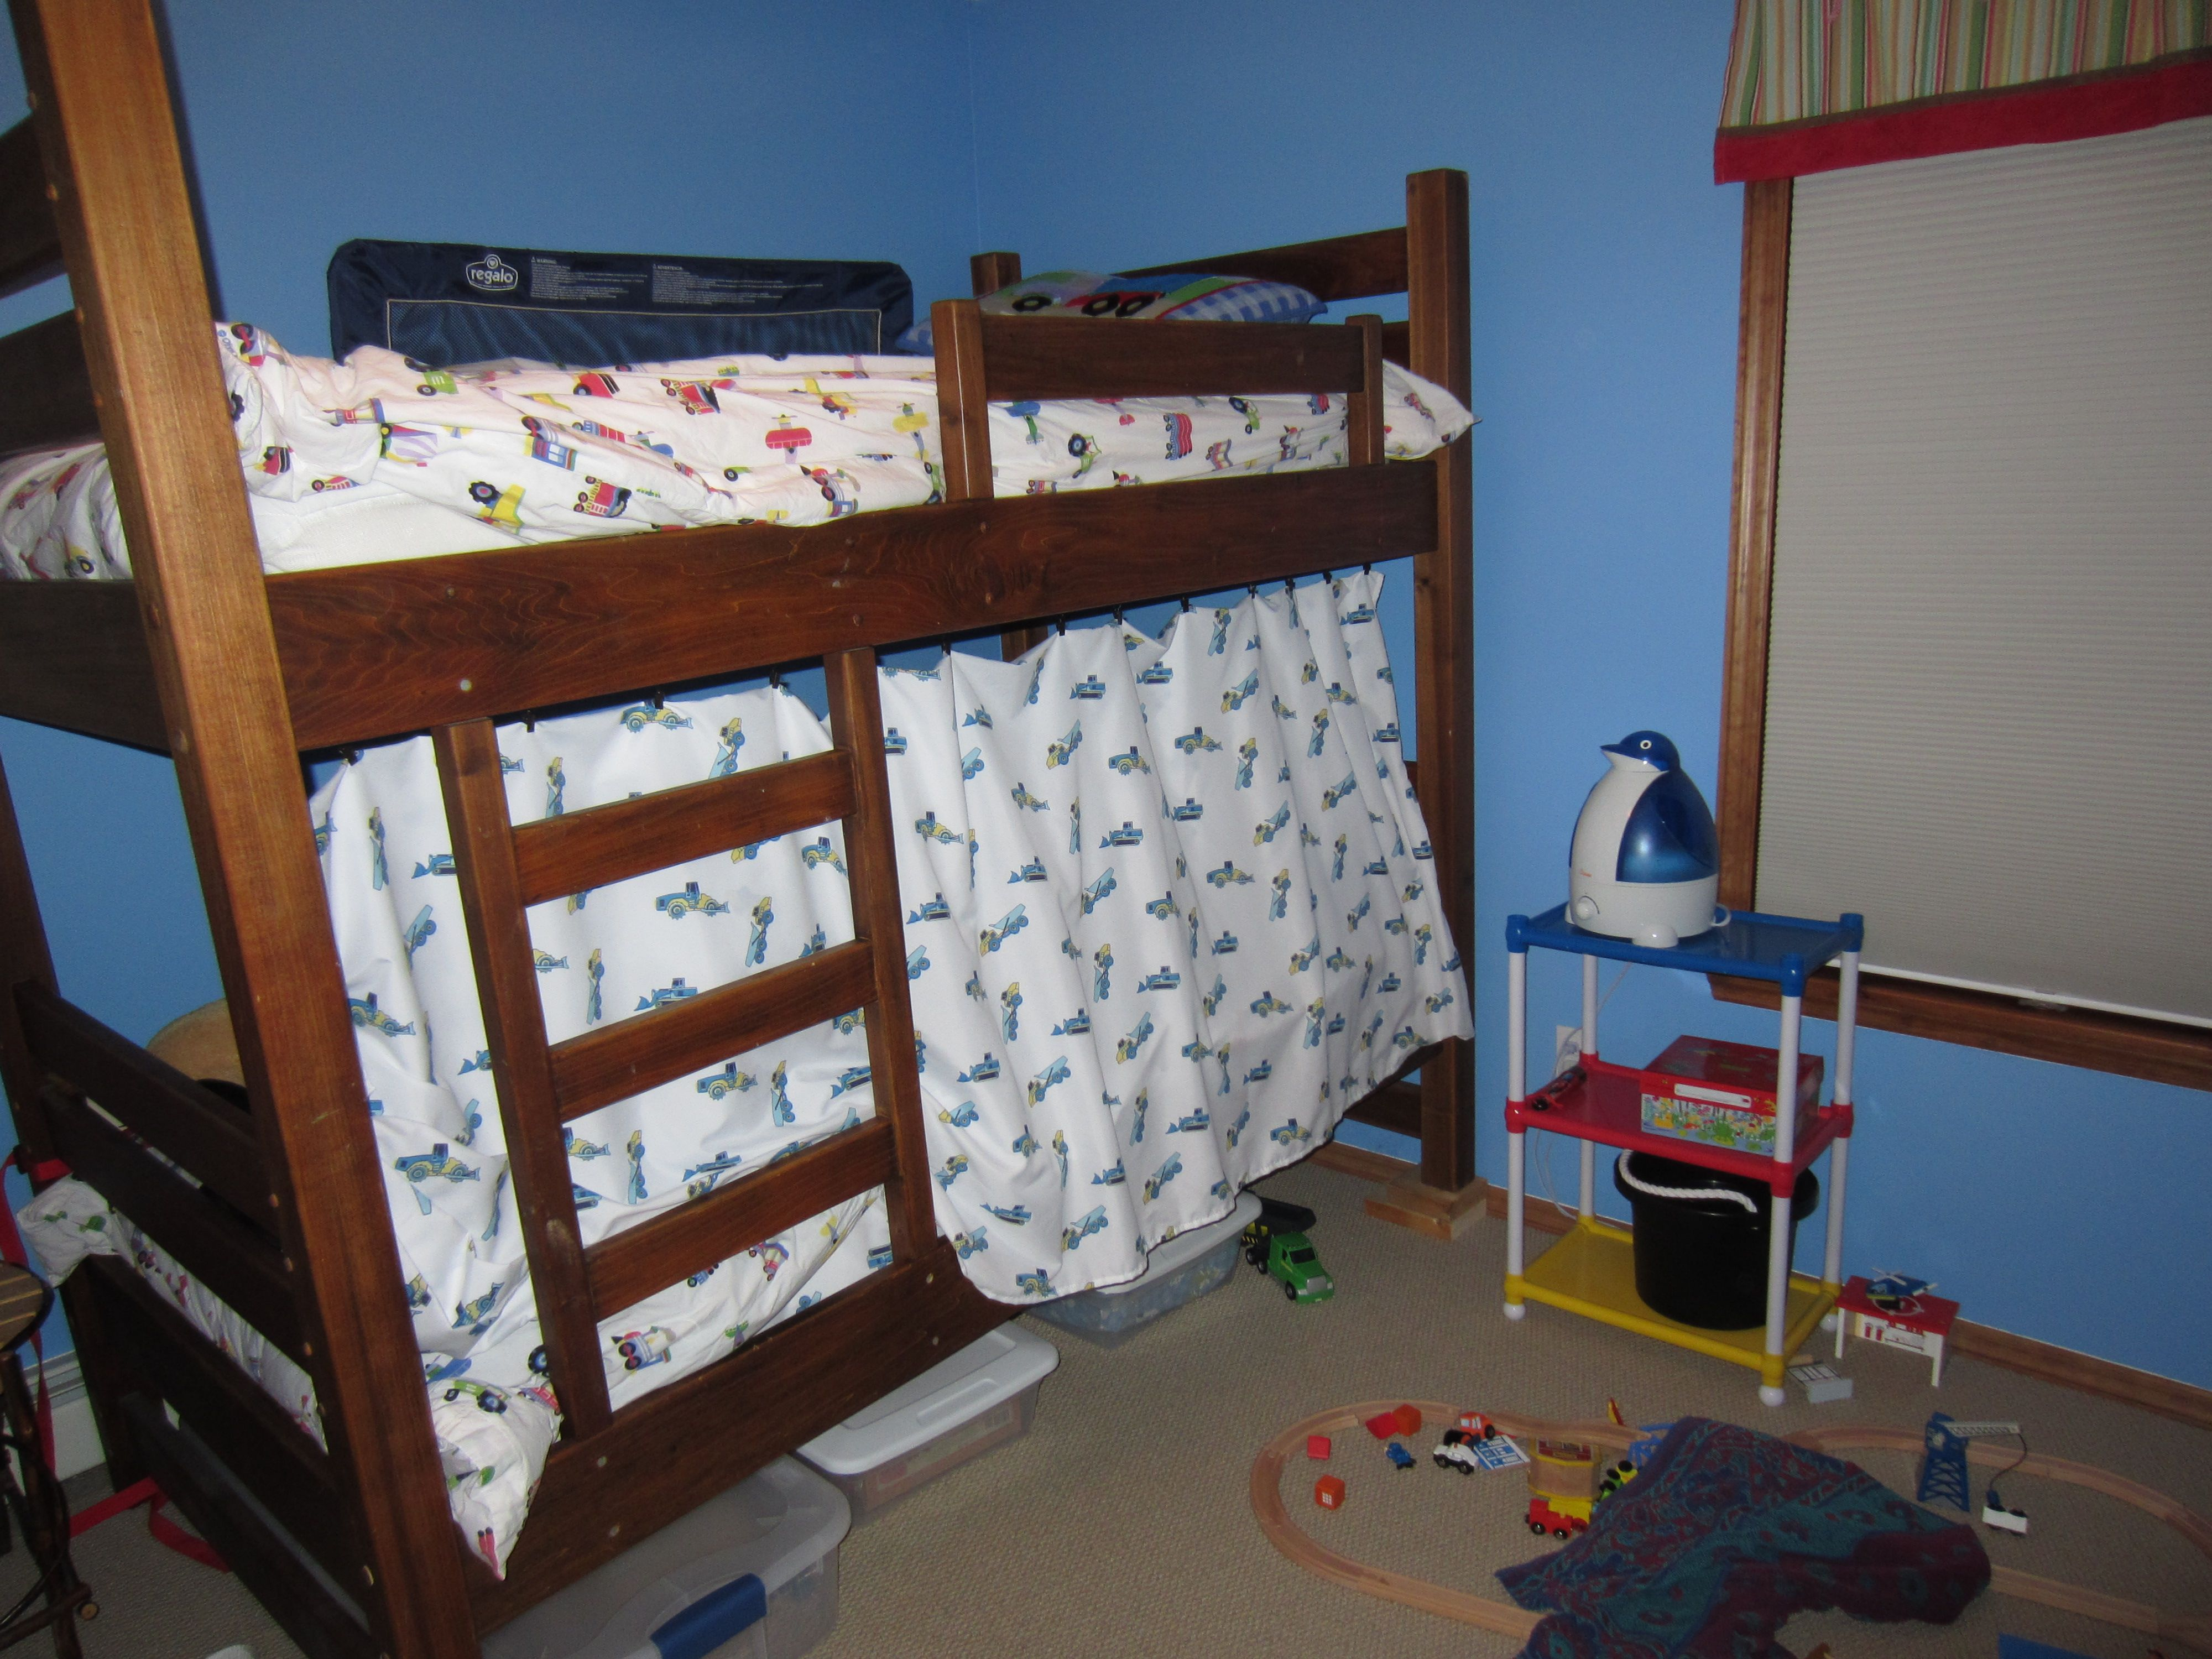 Pin on Kid's Room